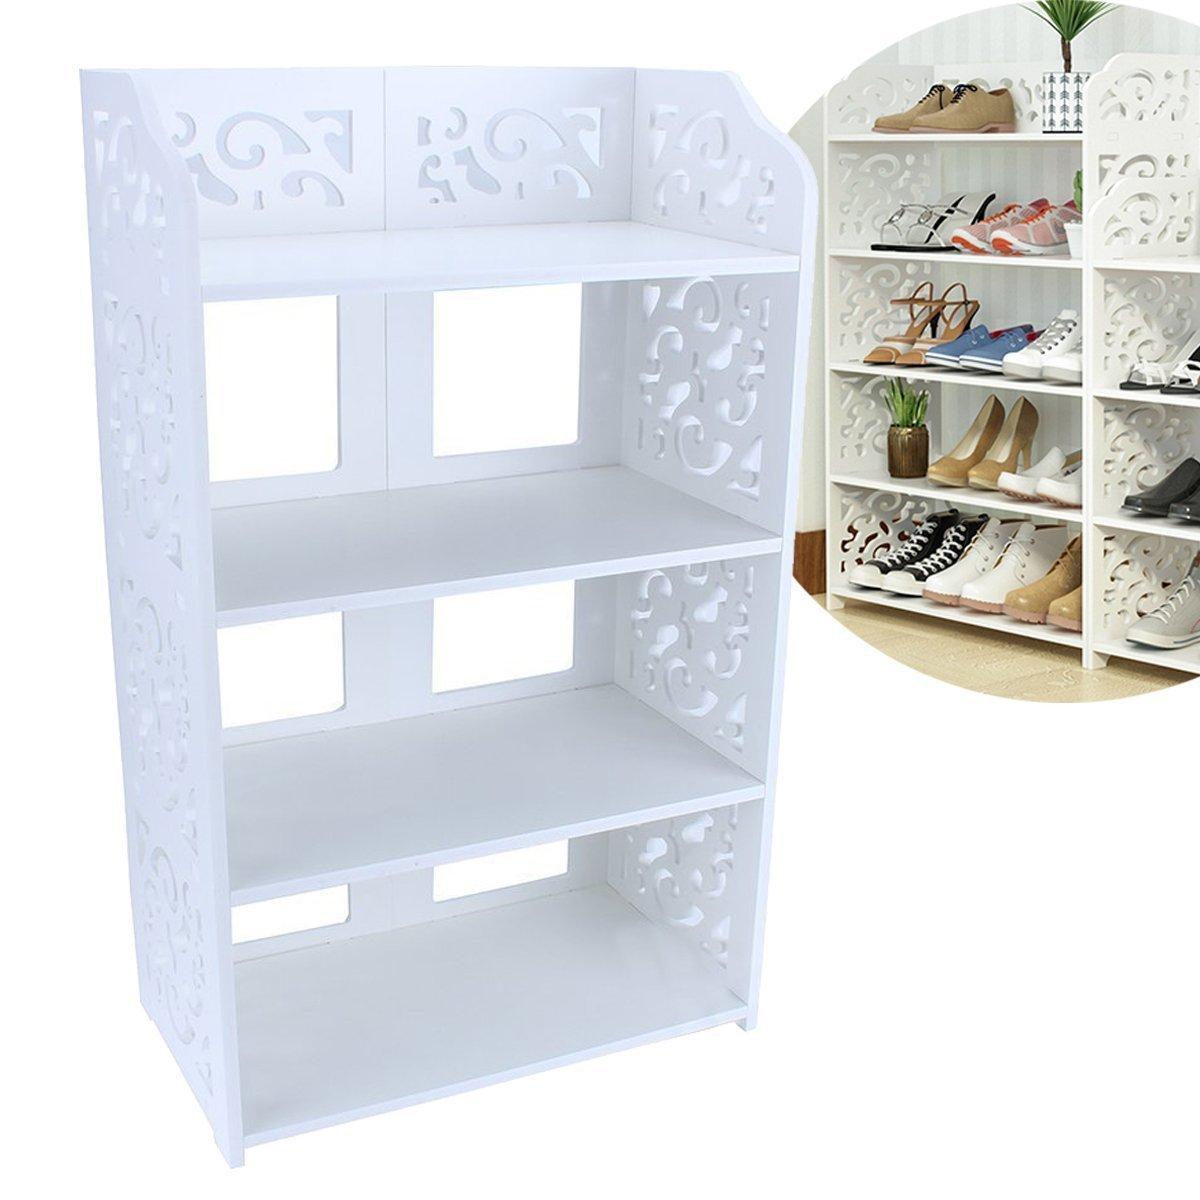 EECOO Home Carved Shoe Cabinet Storage Organiser Shoe Rack Stand Bookshelf CD Display